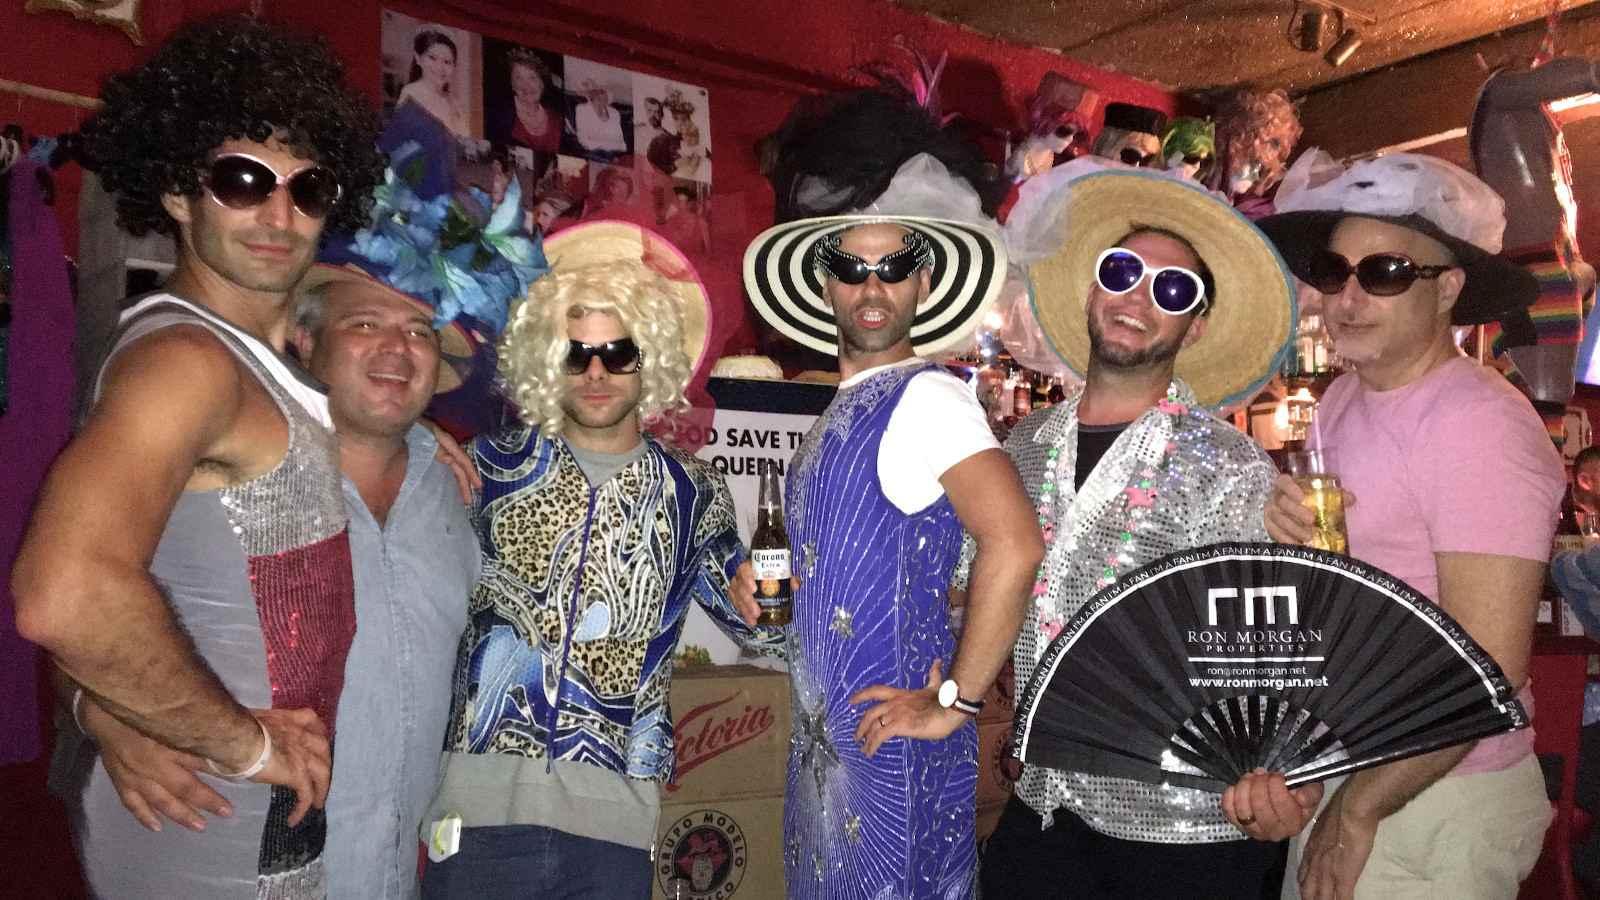 Reinas gay bar in the Zona Romantica gay neighborhood of Puerto Vallarta